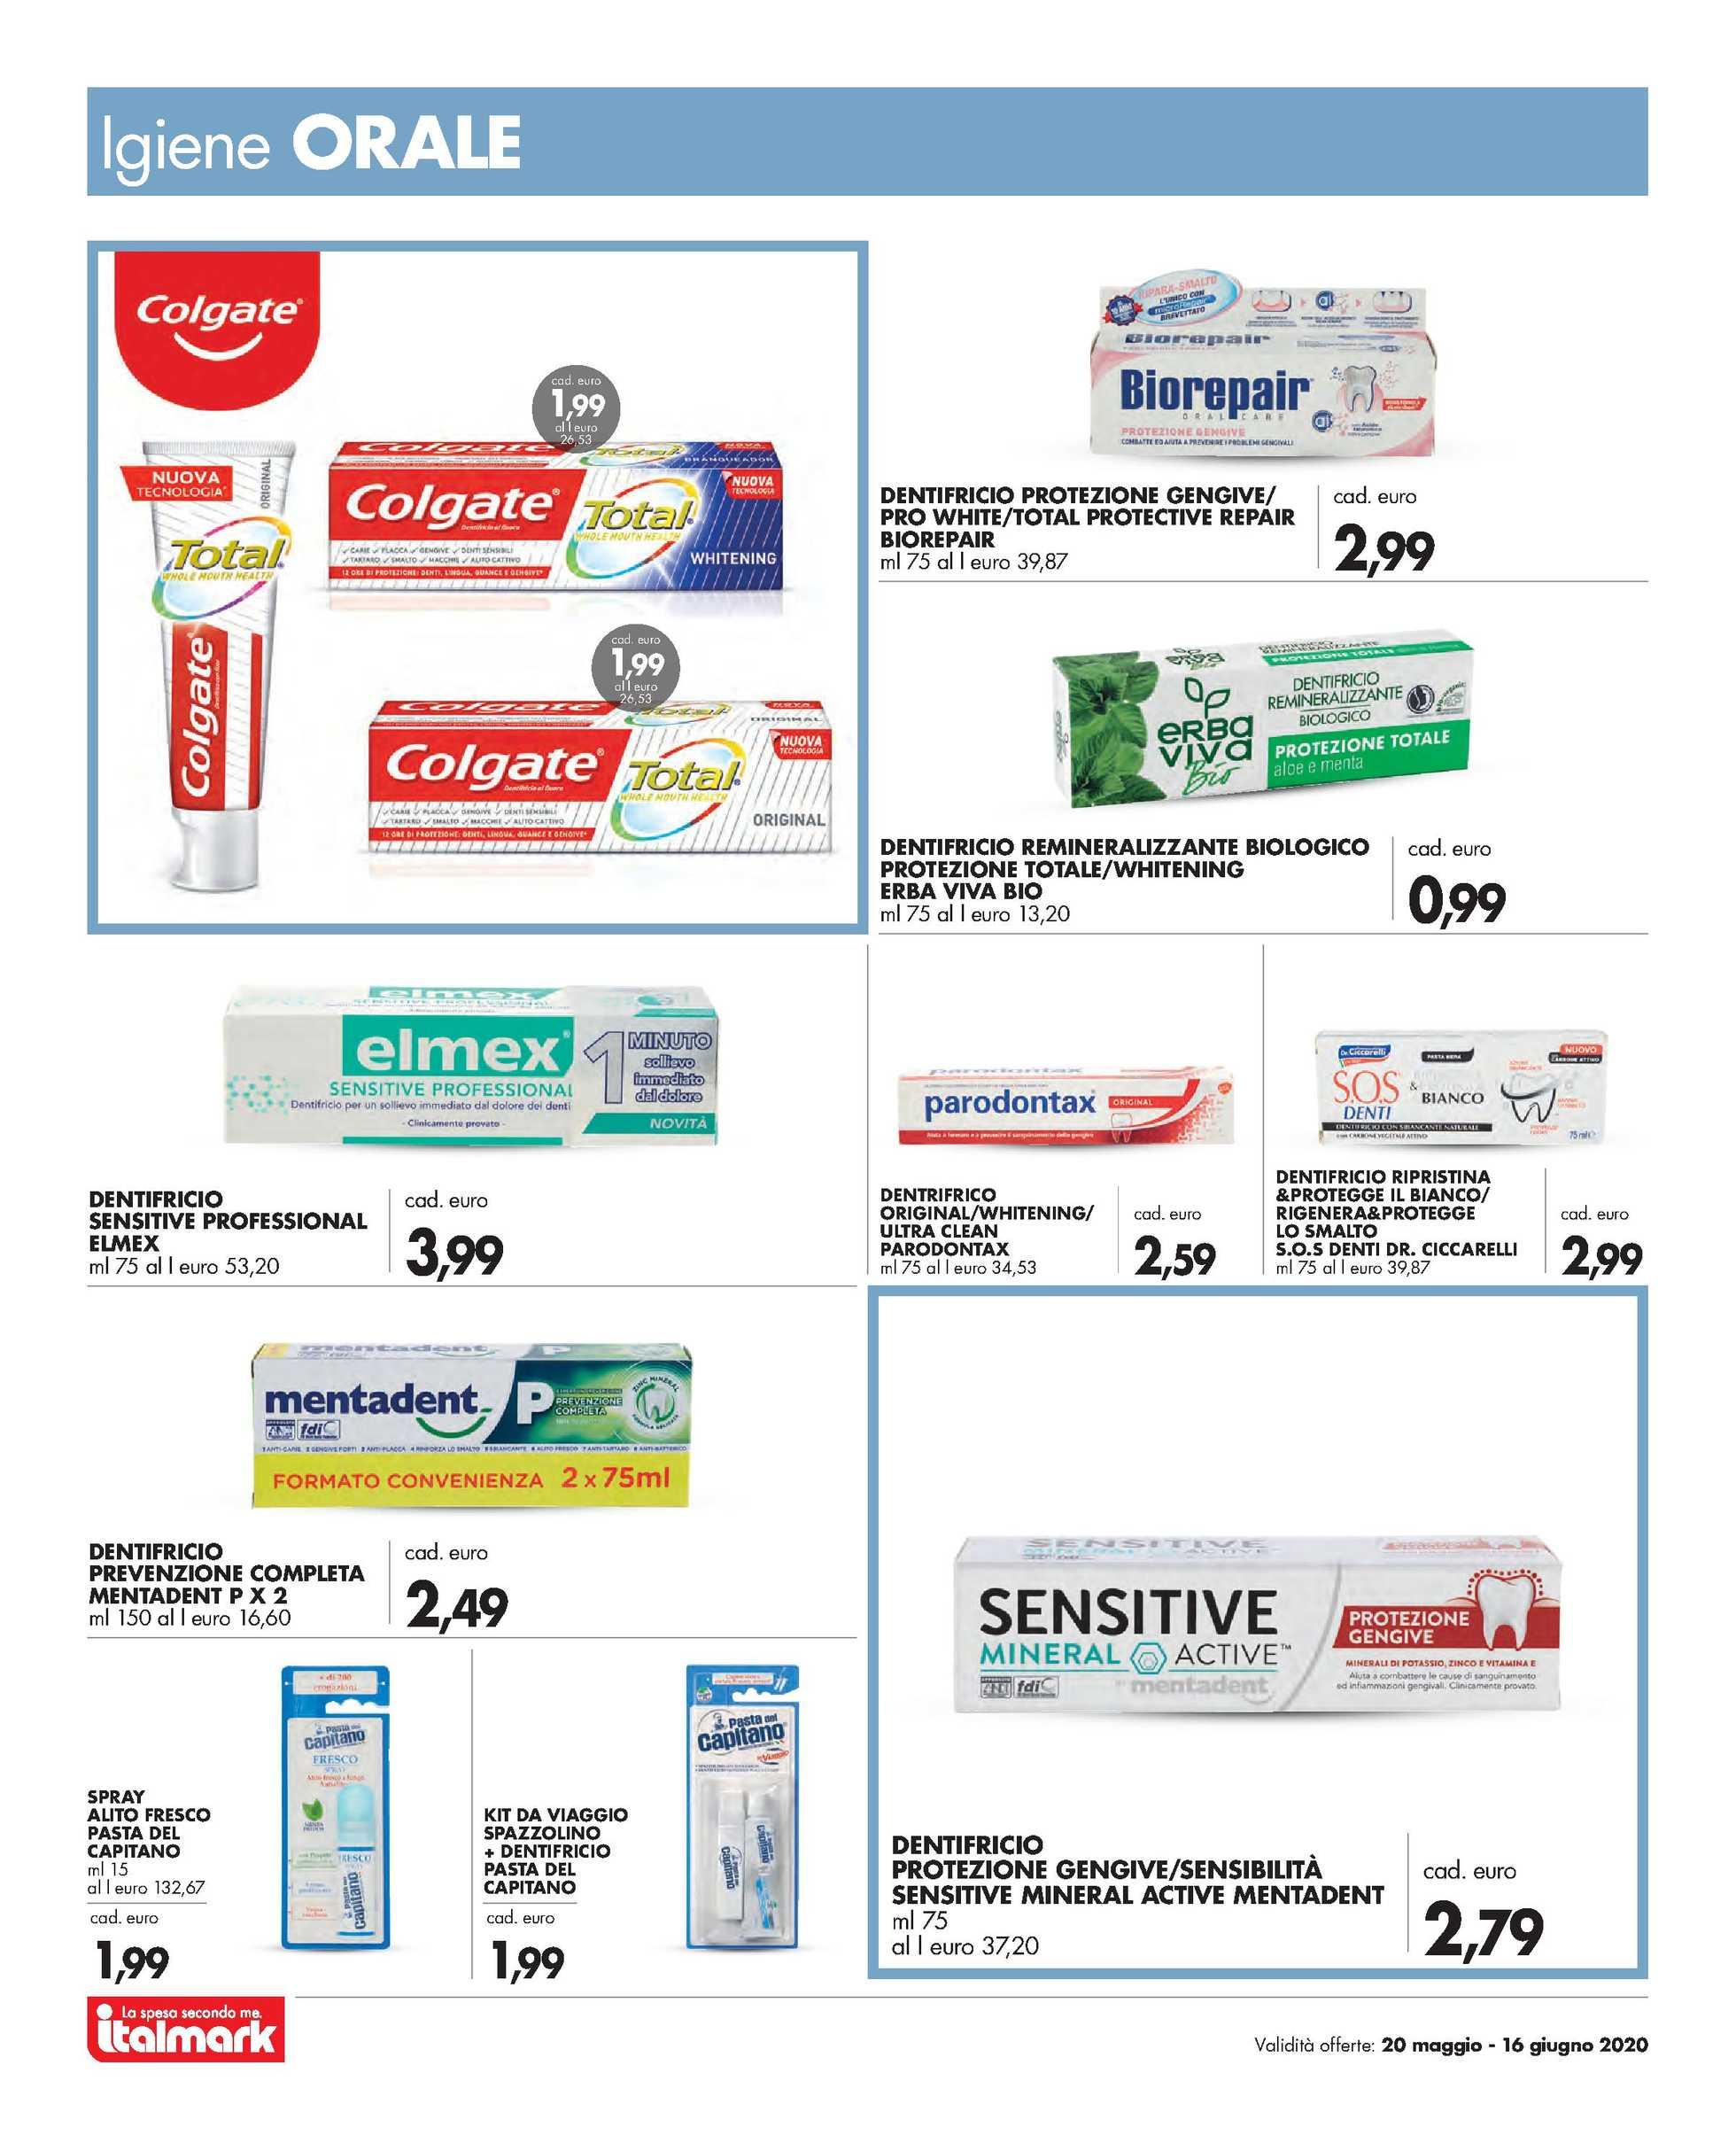 Italmark - offerte valide dal 20.05.2020 al 16.06.2020 - pagina 4.